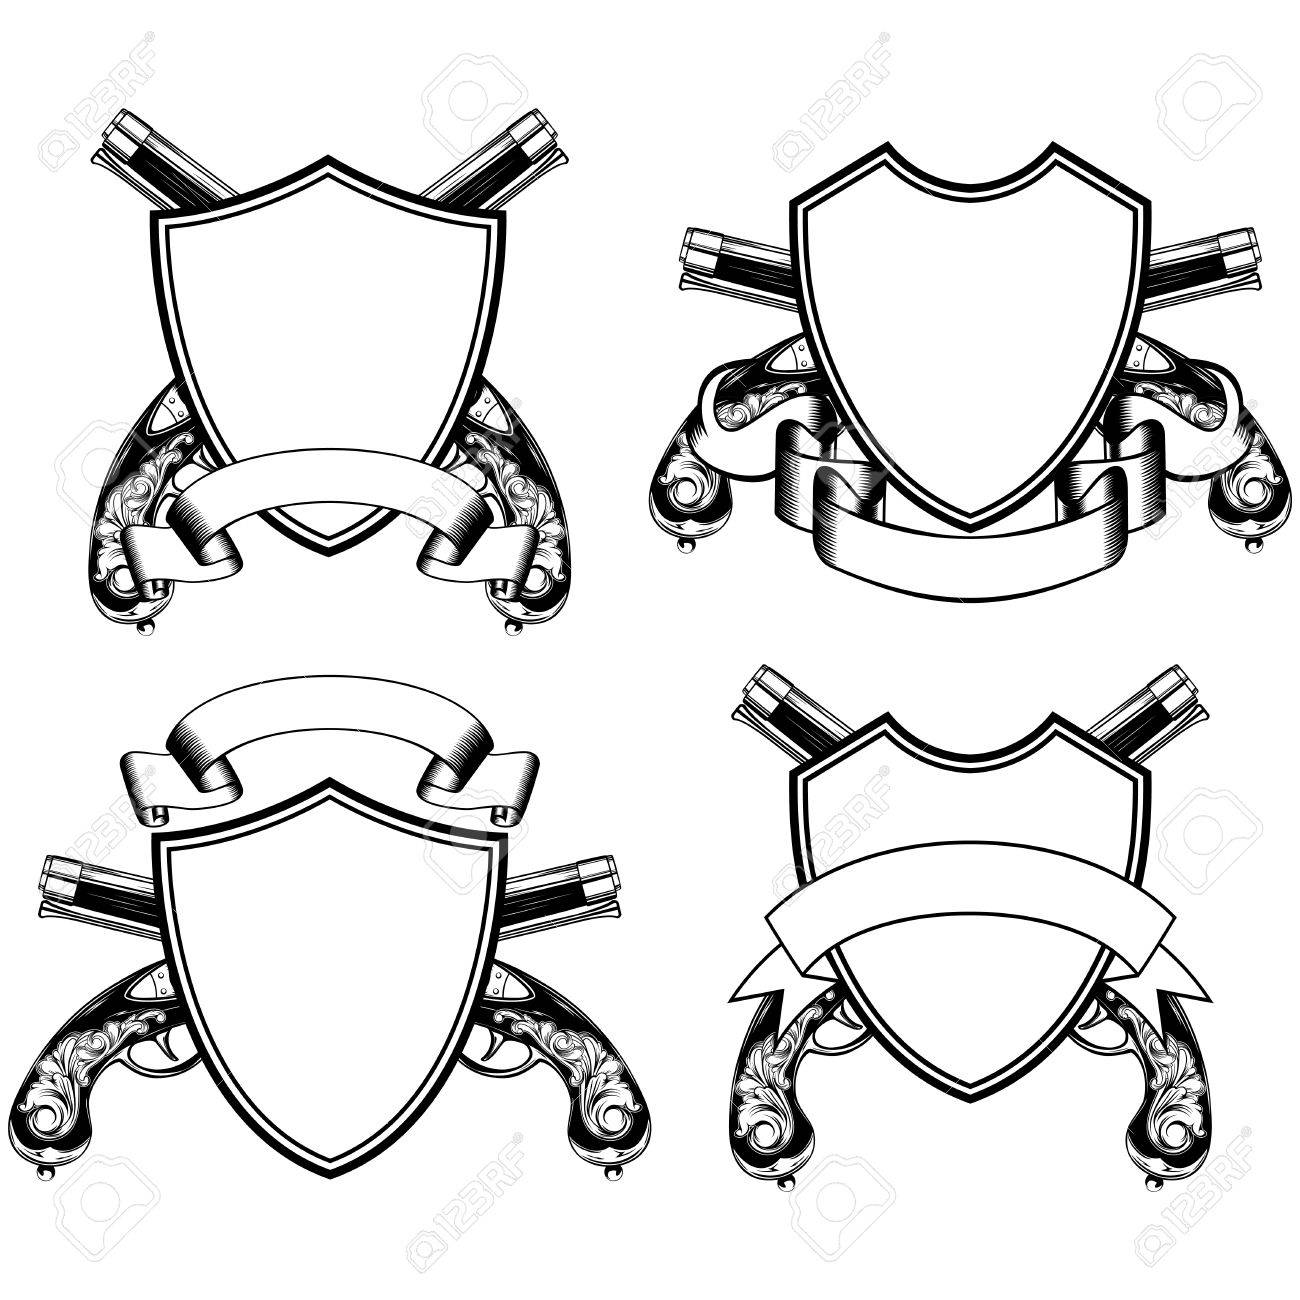 vector illustration crossed old flintlock pistols and shield Flintlock Longrifle vector vector illustration crossed old flintlock pistols and shield with ribbon